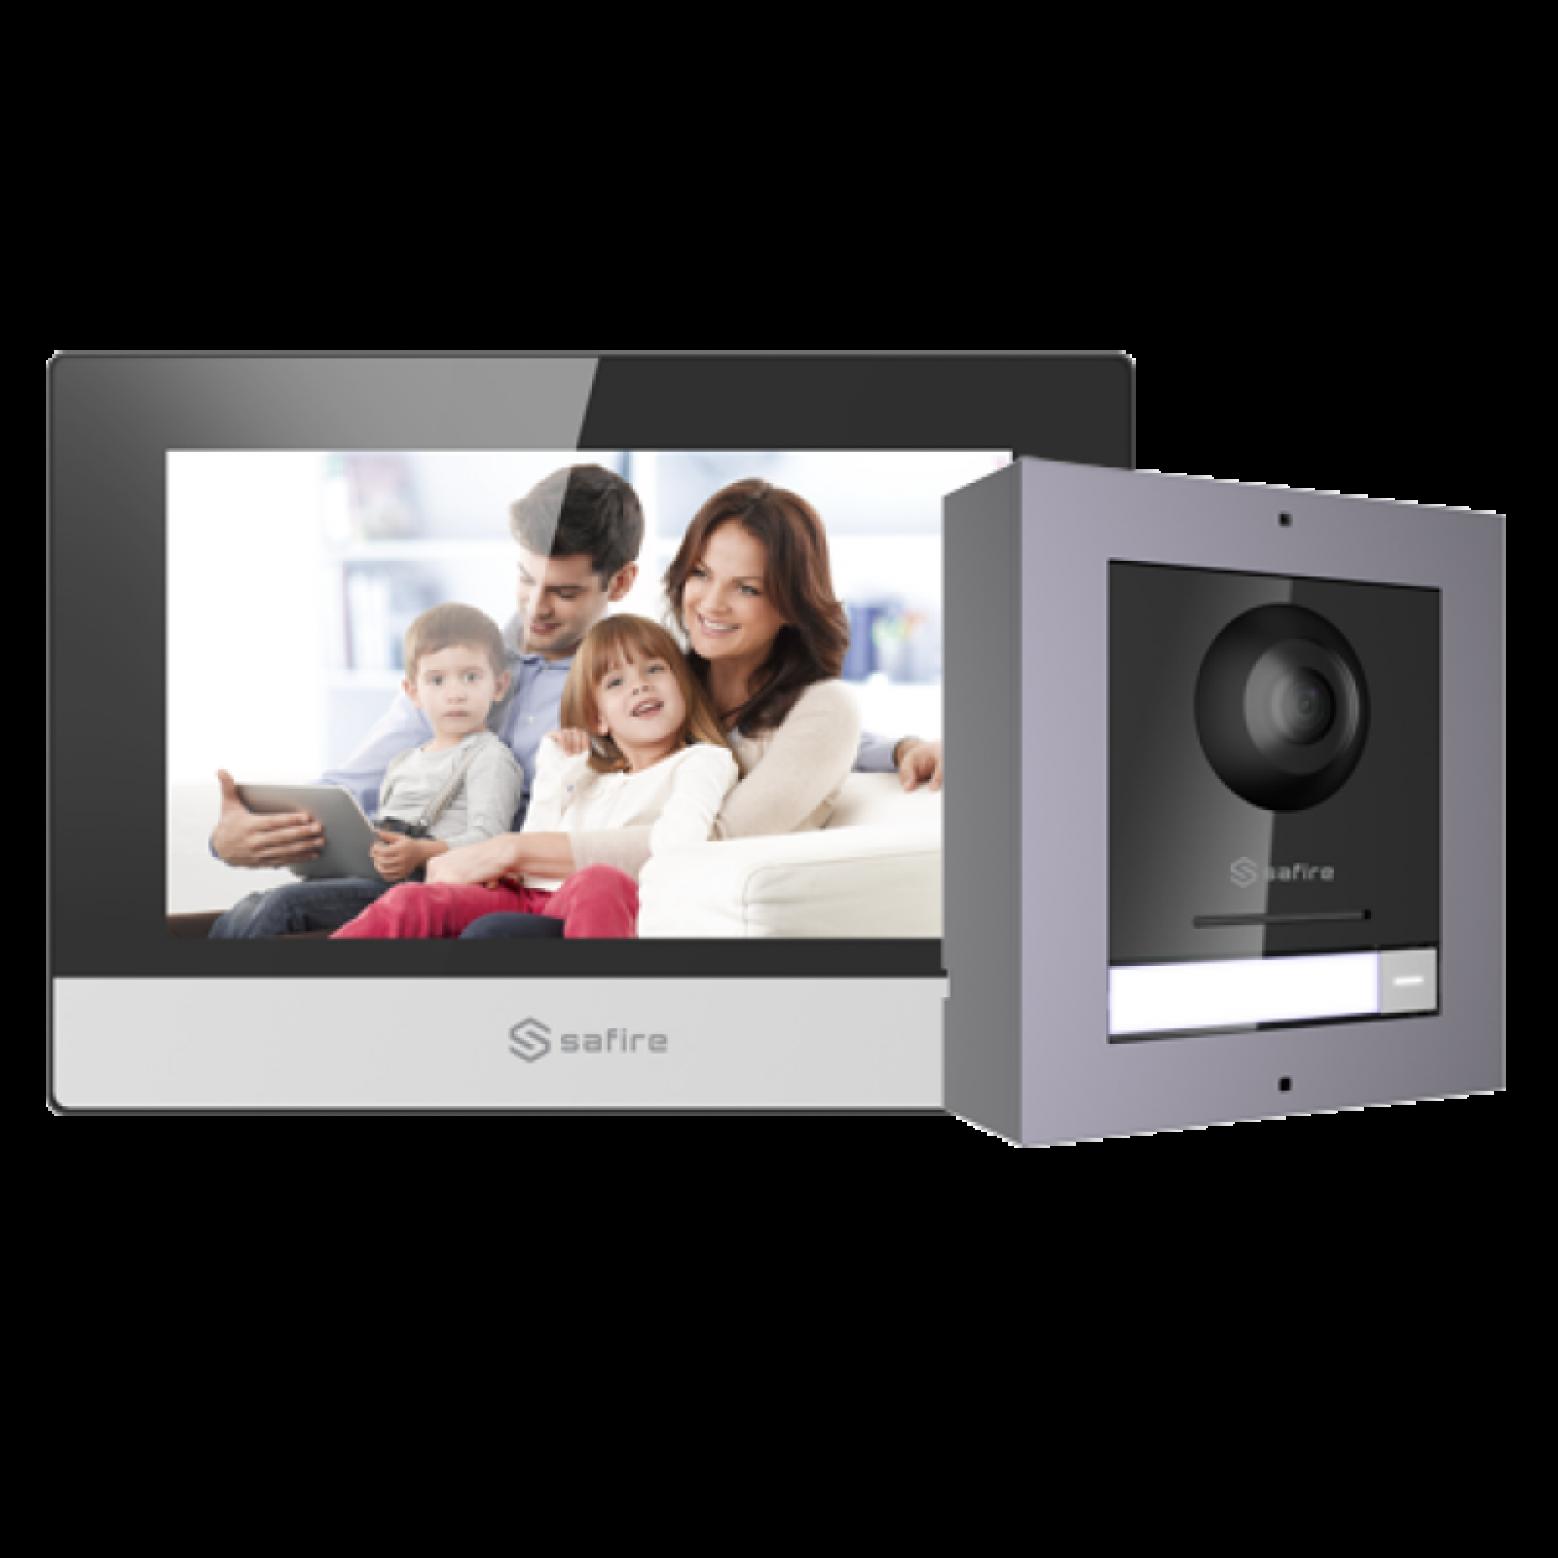 Safire SF-VIK001-S-IP intercomsysteem met 7 monitor